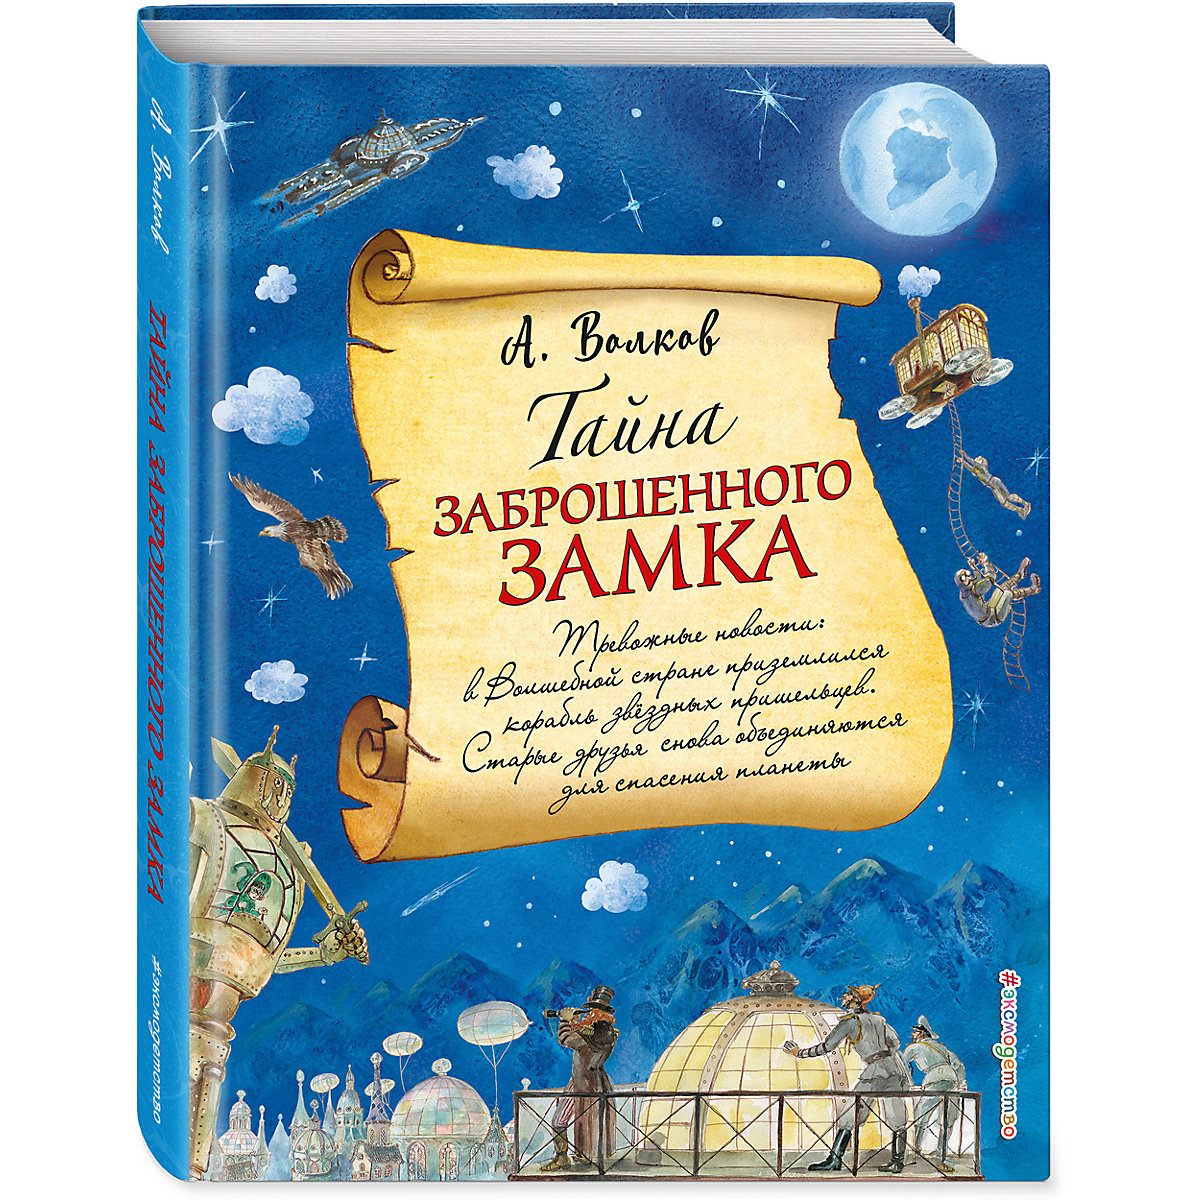 Books EKSMO 8852920 Children Education Encyclopedia Alphabet Dictionary Book For Baby MTpromo